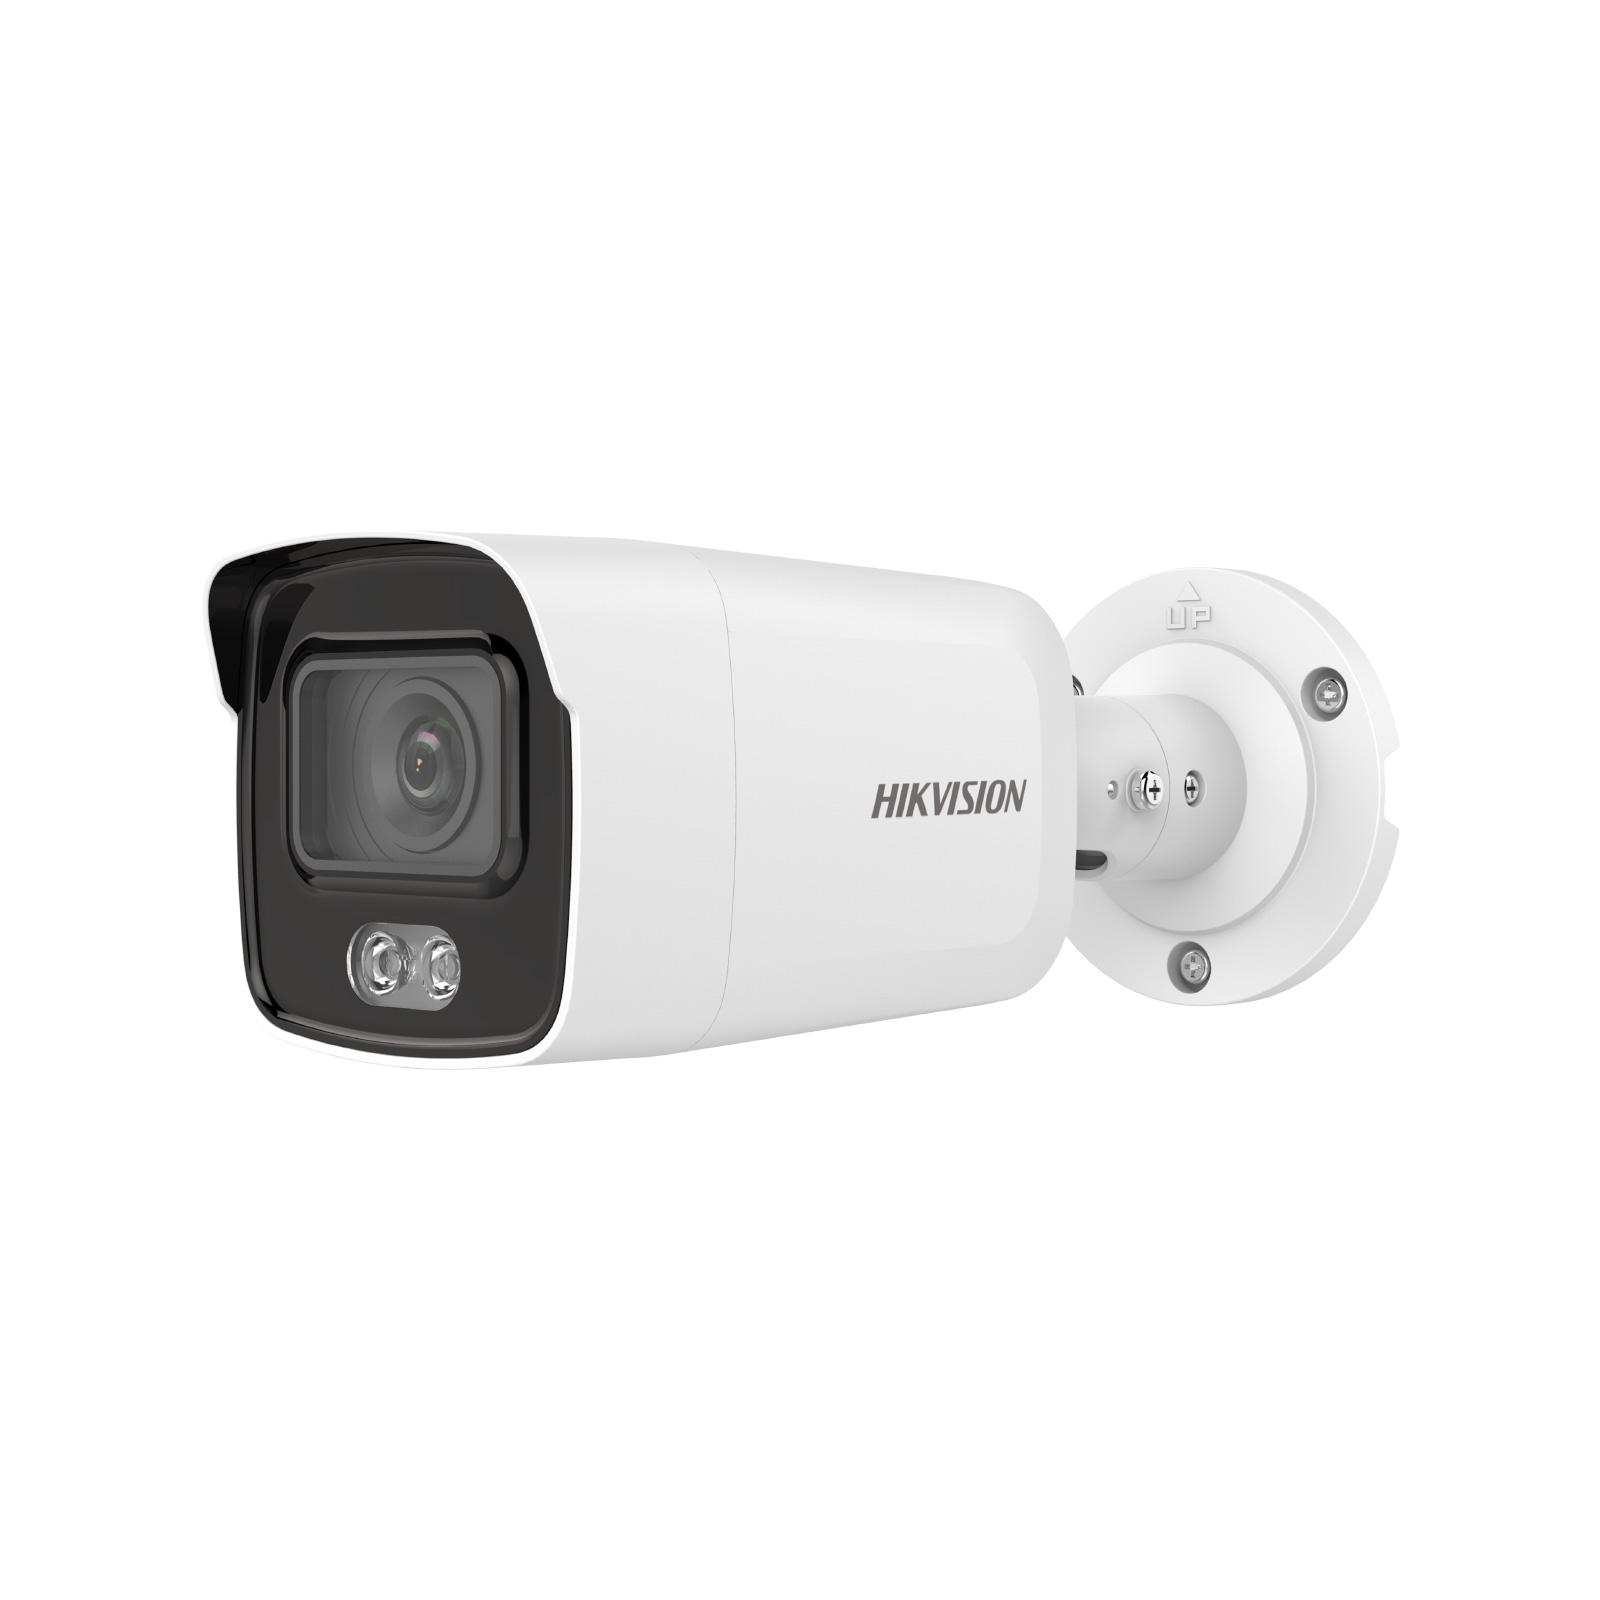 Hikvision-DS-2CD2047G1-L 4MM-Hikvision-DS-2CD2047G1-L 4MM-DS-2CD2047G1-L 4MM-Video Surveillance | Laptop Mechanic